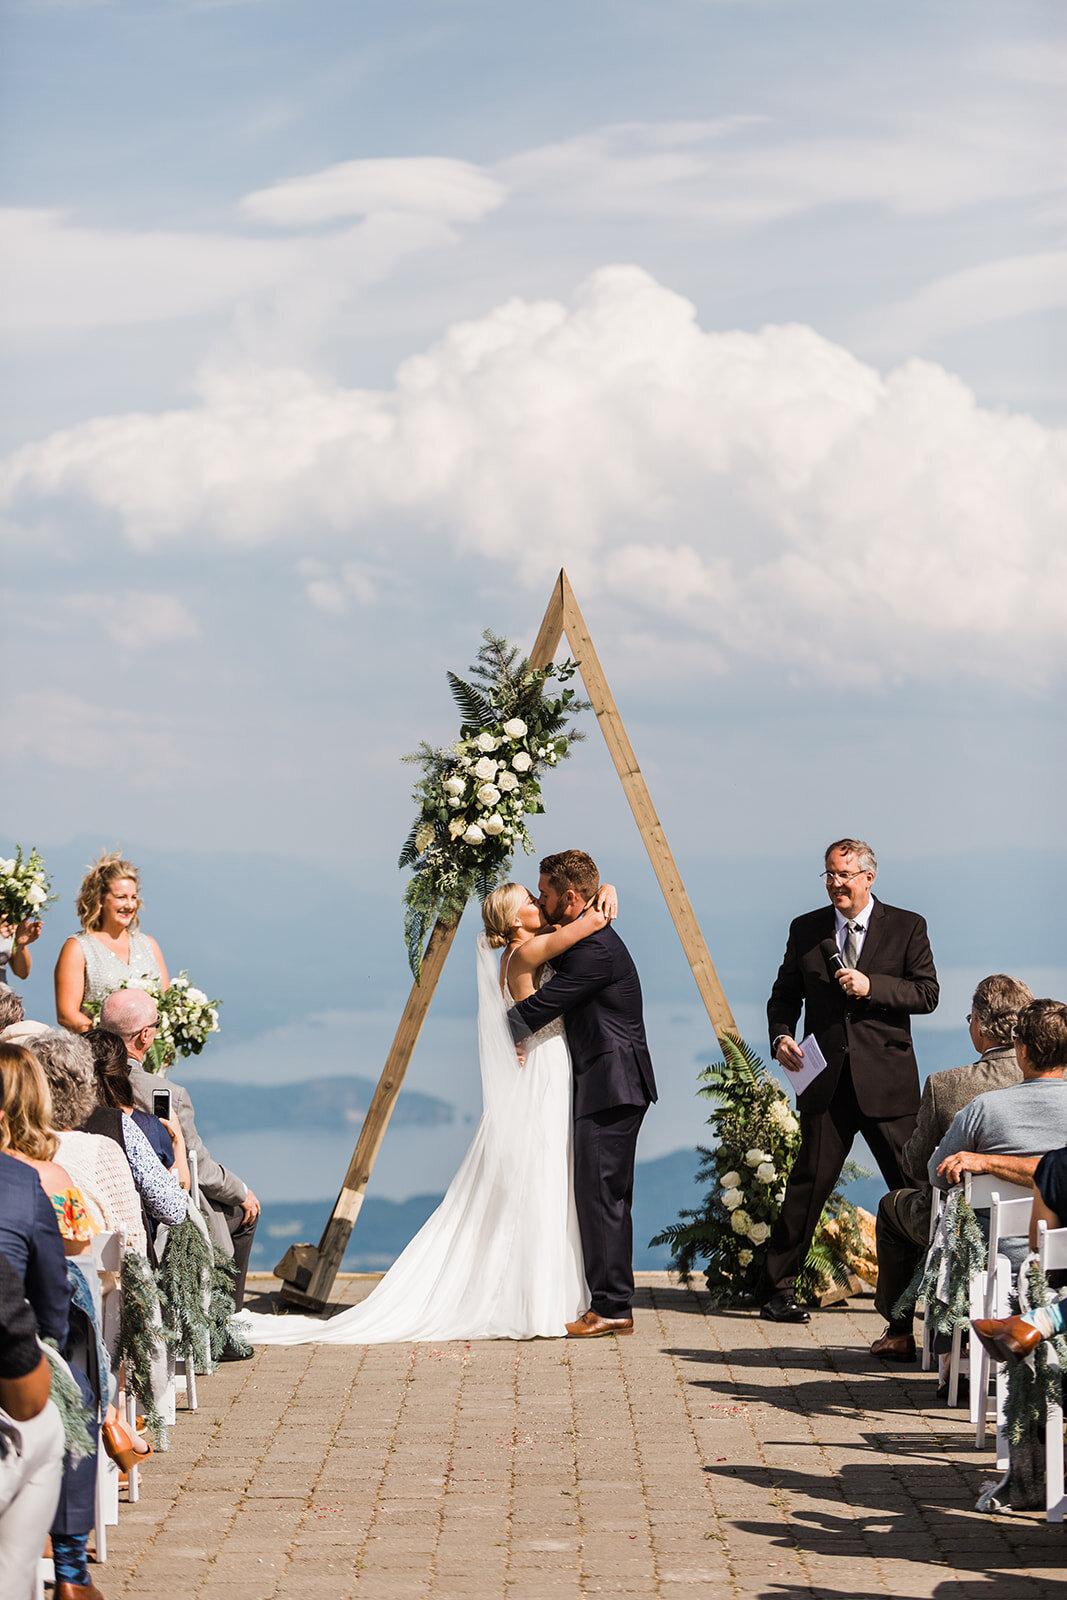 first kiss bride and groom spokane wedding